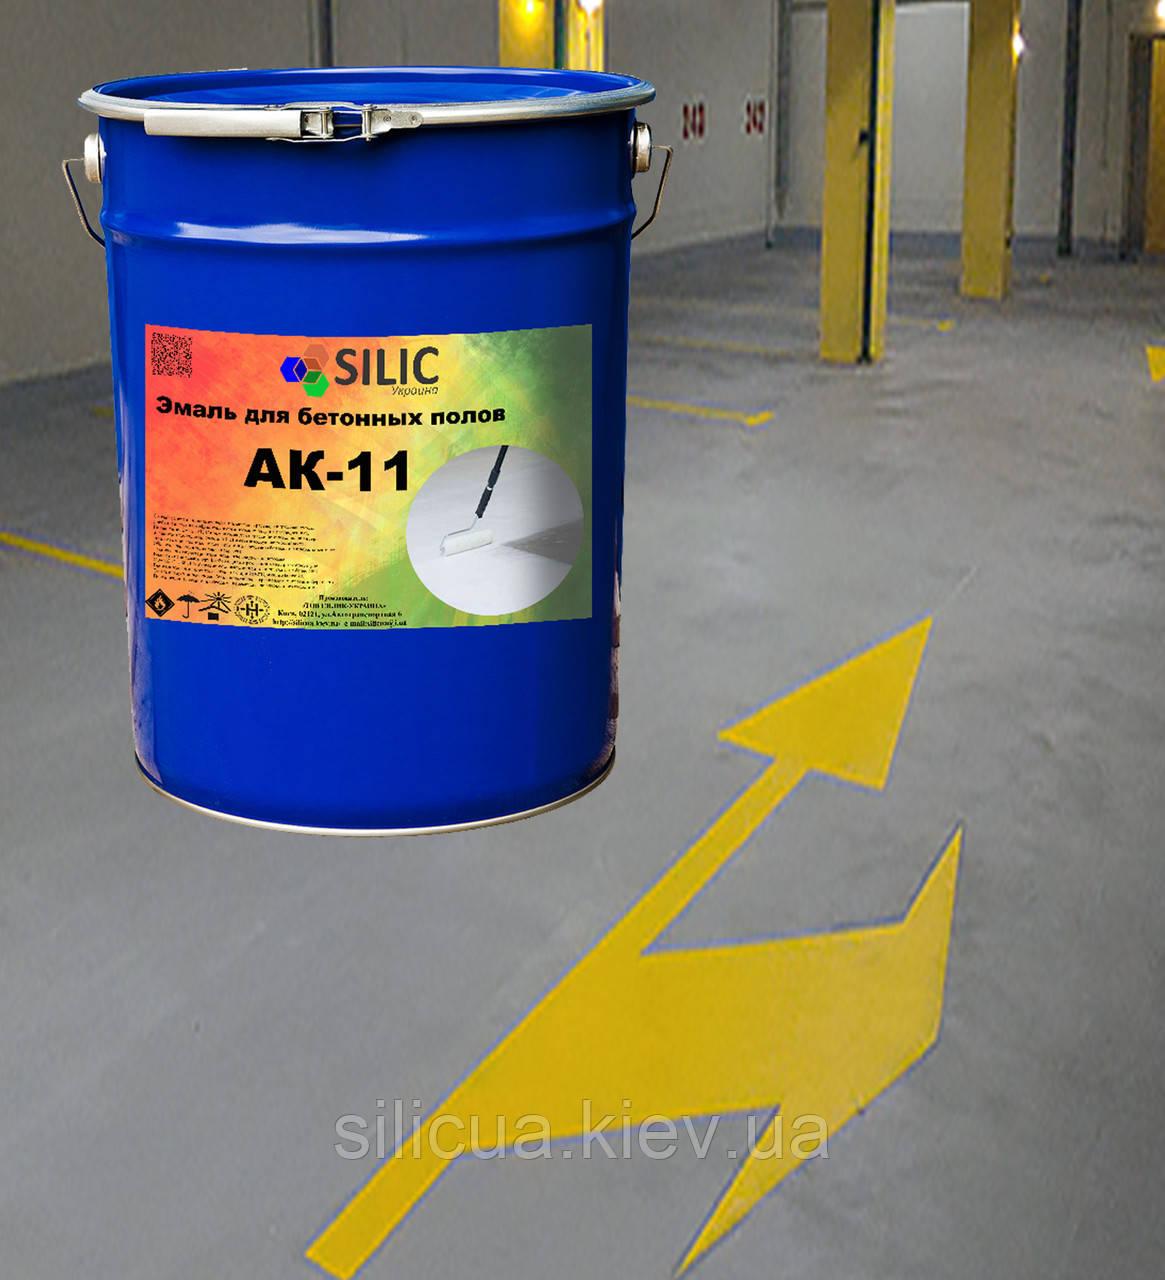 Краска для разметки дорог АК-11